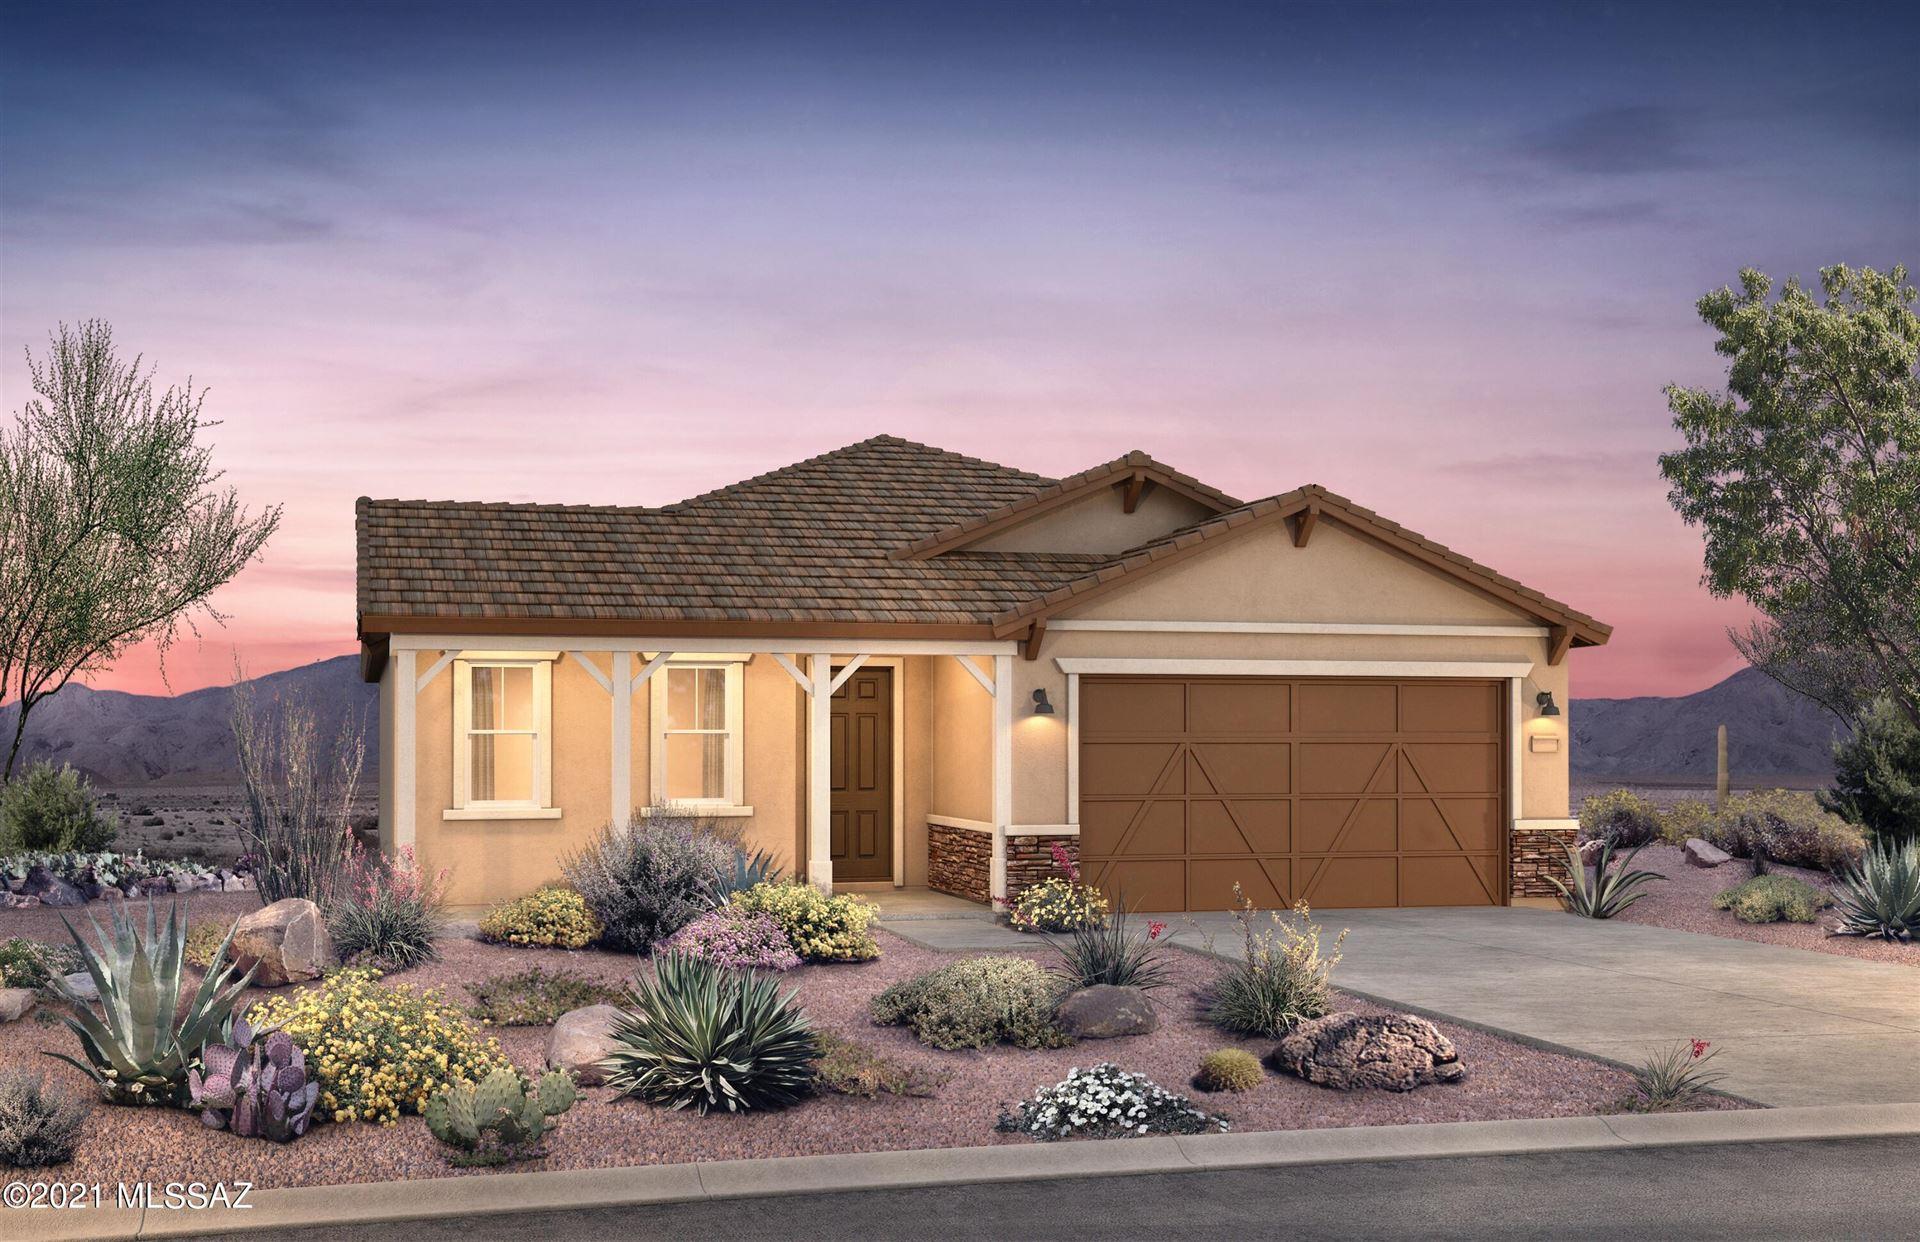 8330 W Spaulding W Street, Tucson, AZ 85743 - MLS#: 22108530